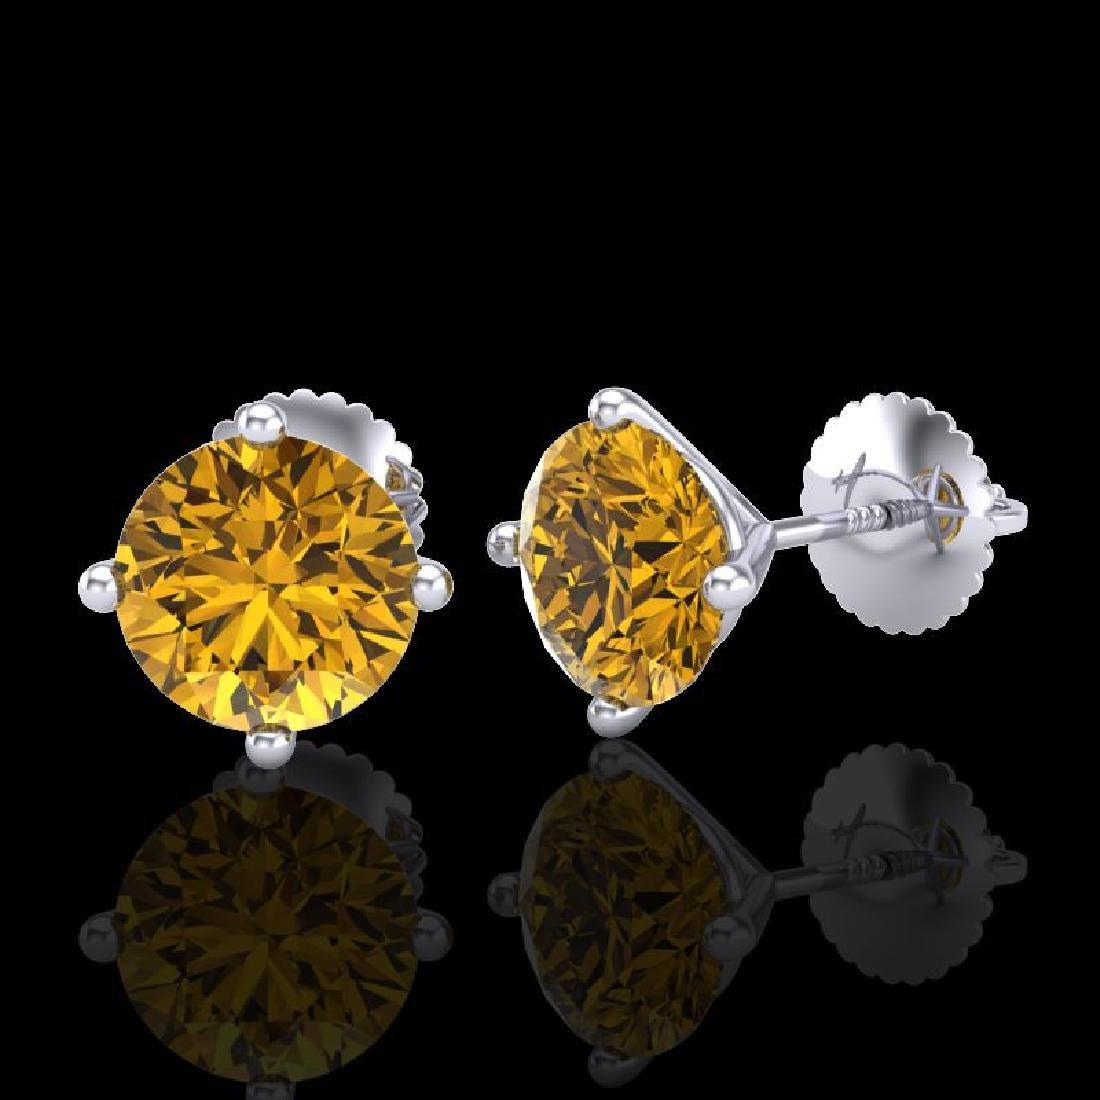 2.5 CTW Intense Fancy Yellow Diamond Art Deco Stud - 2